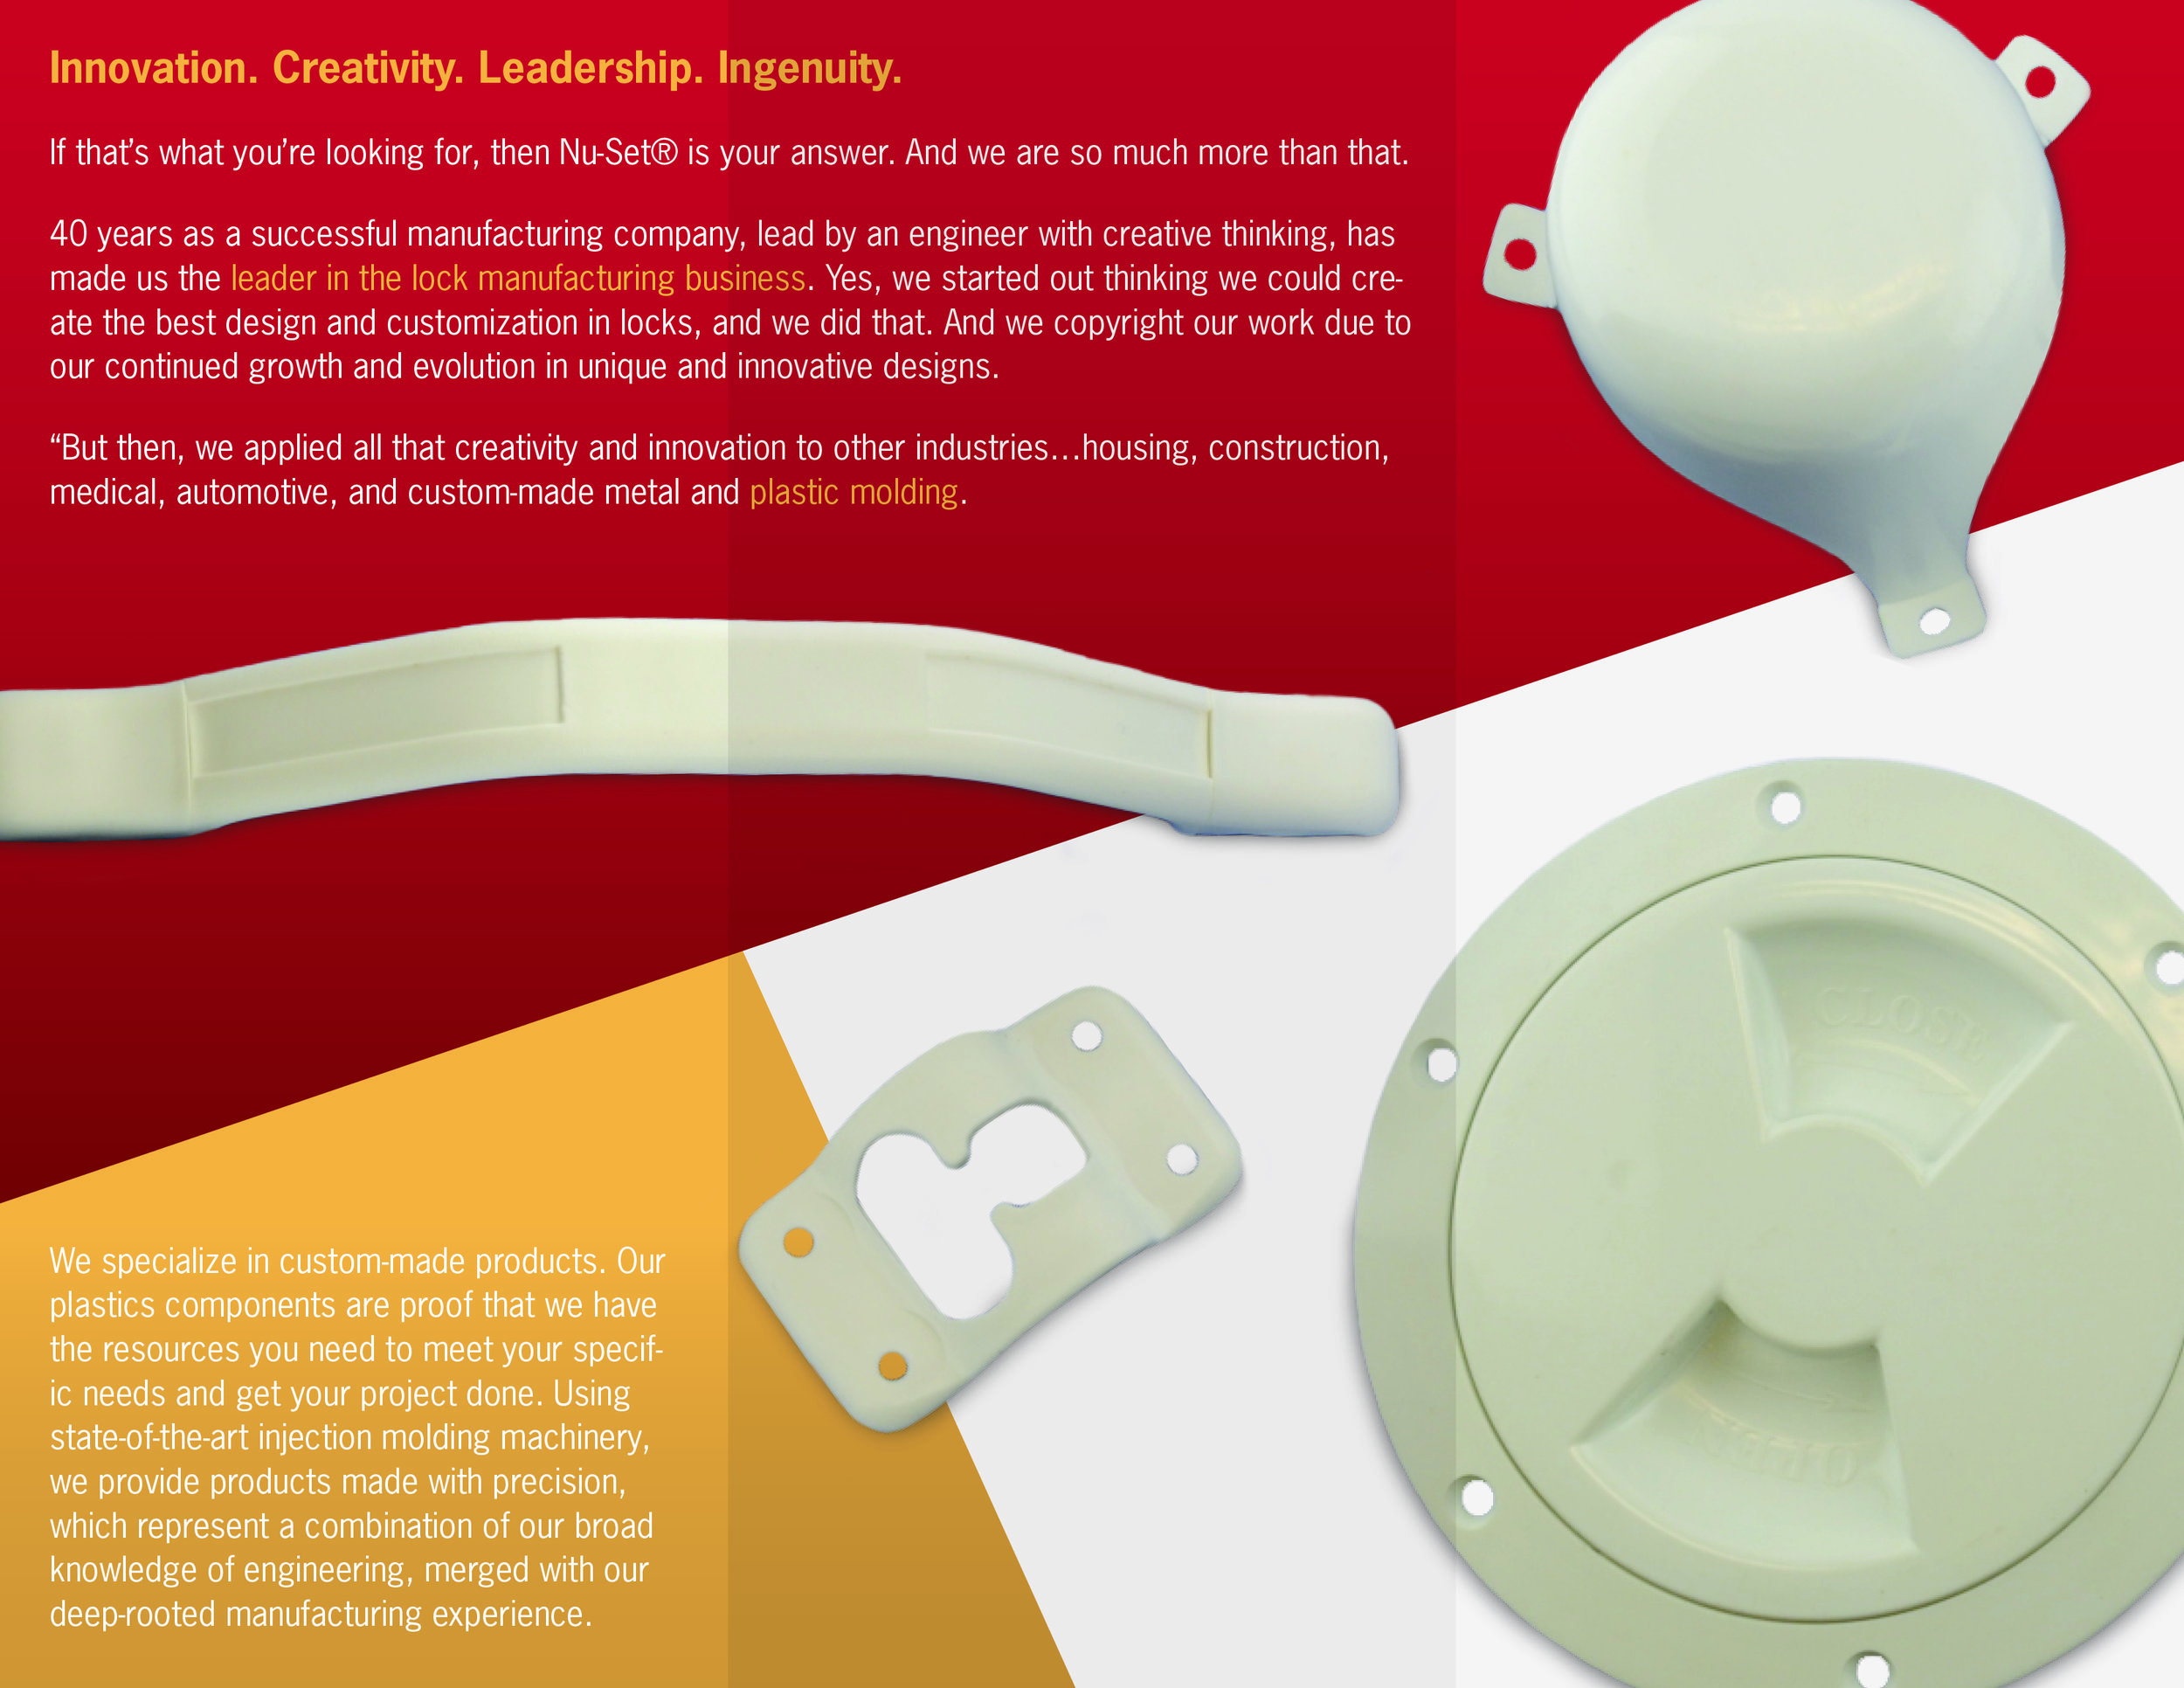 Plastics Trifold Brochure (INSIDE)